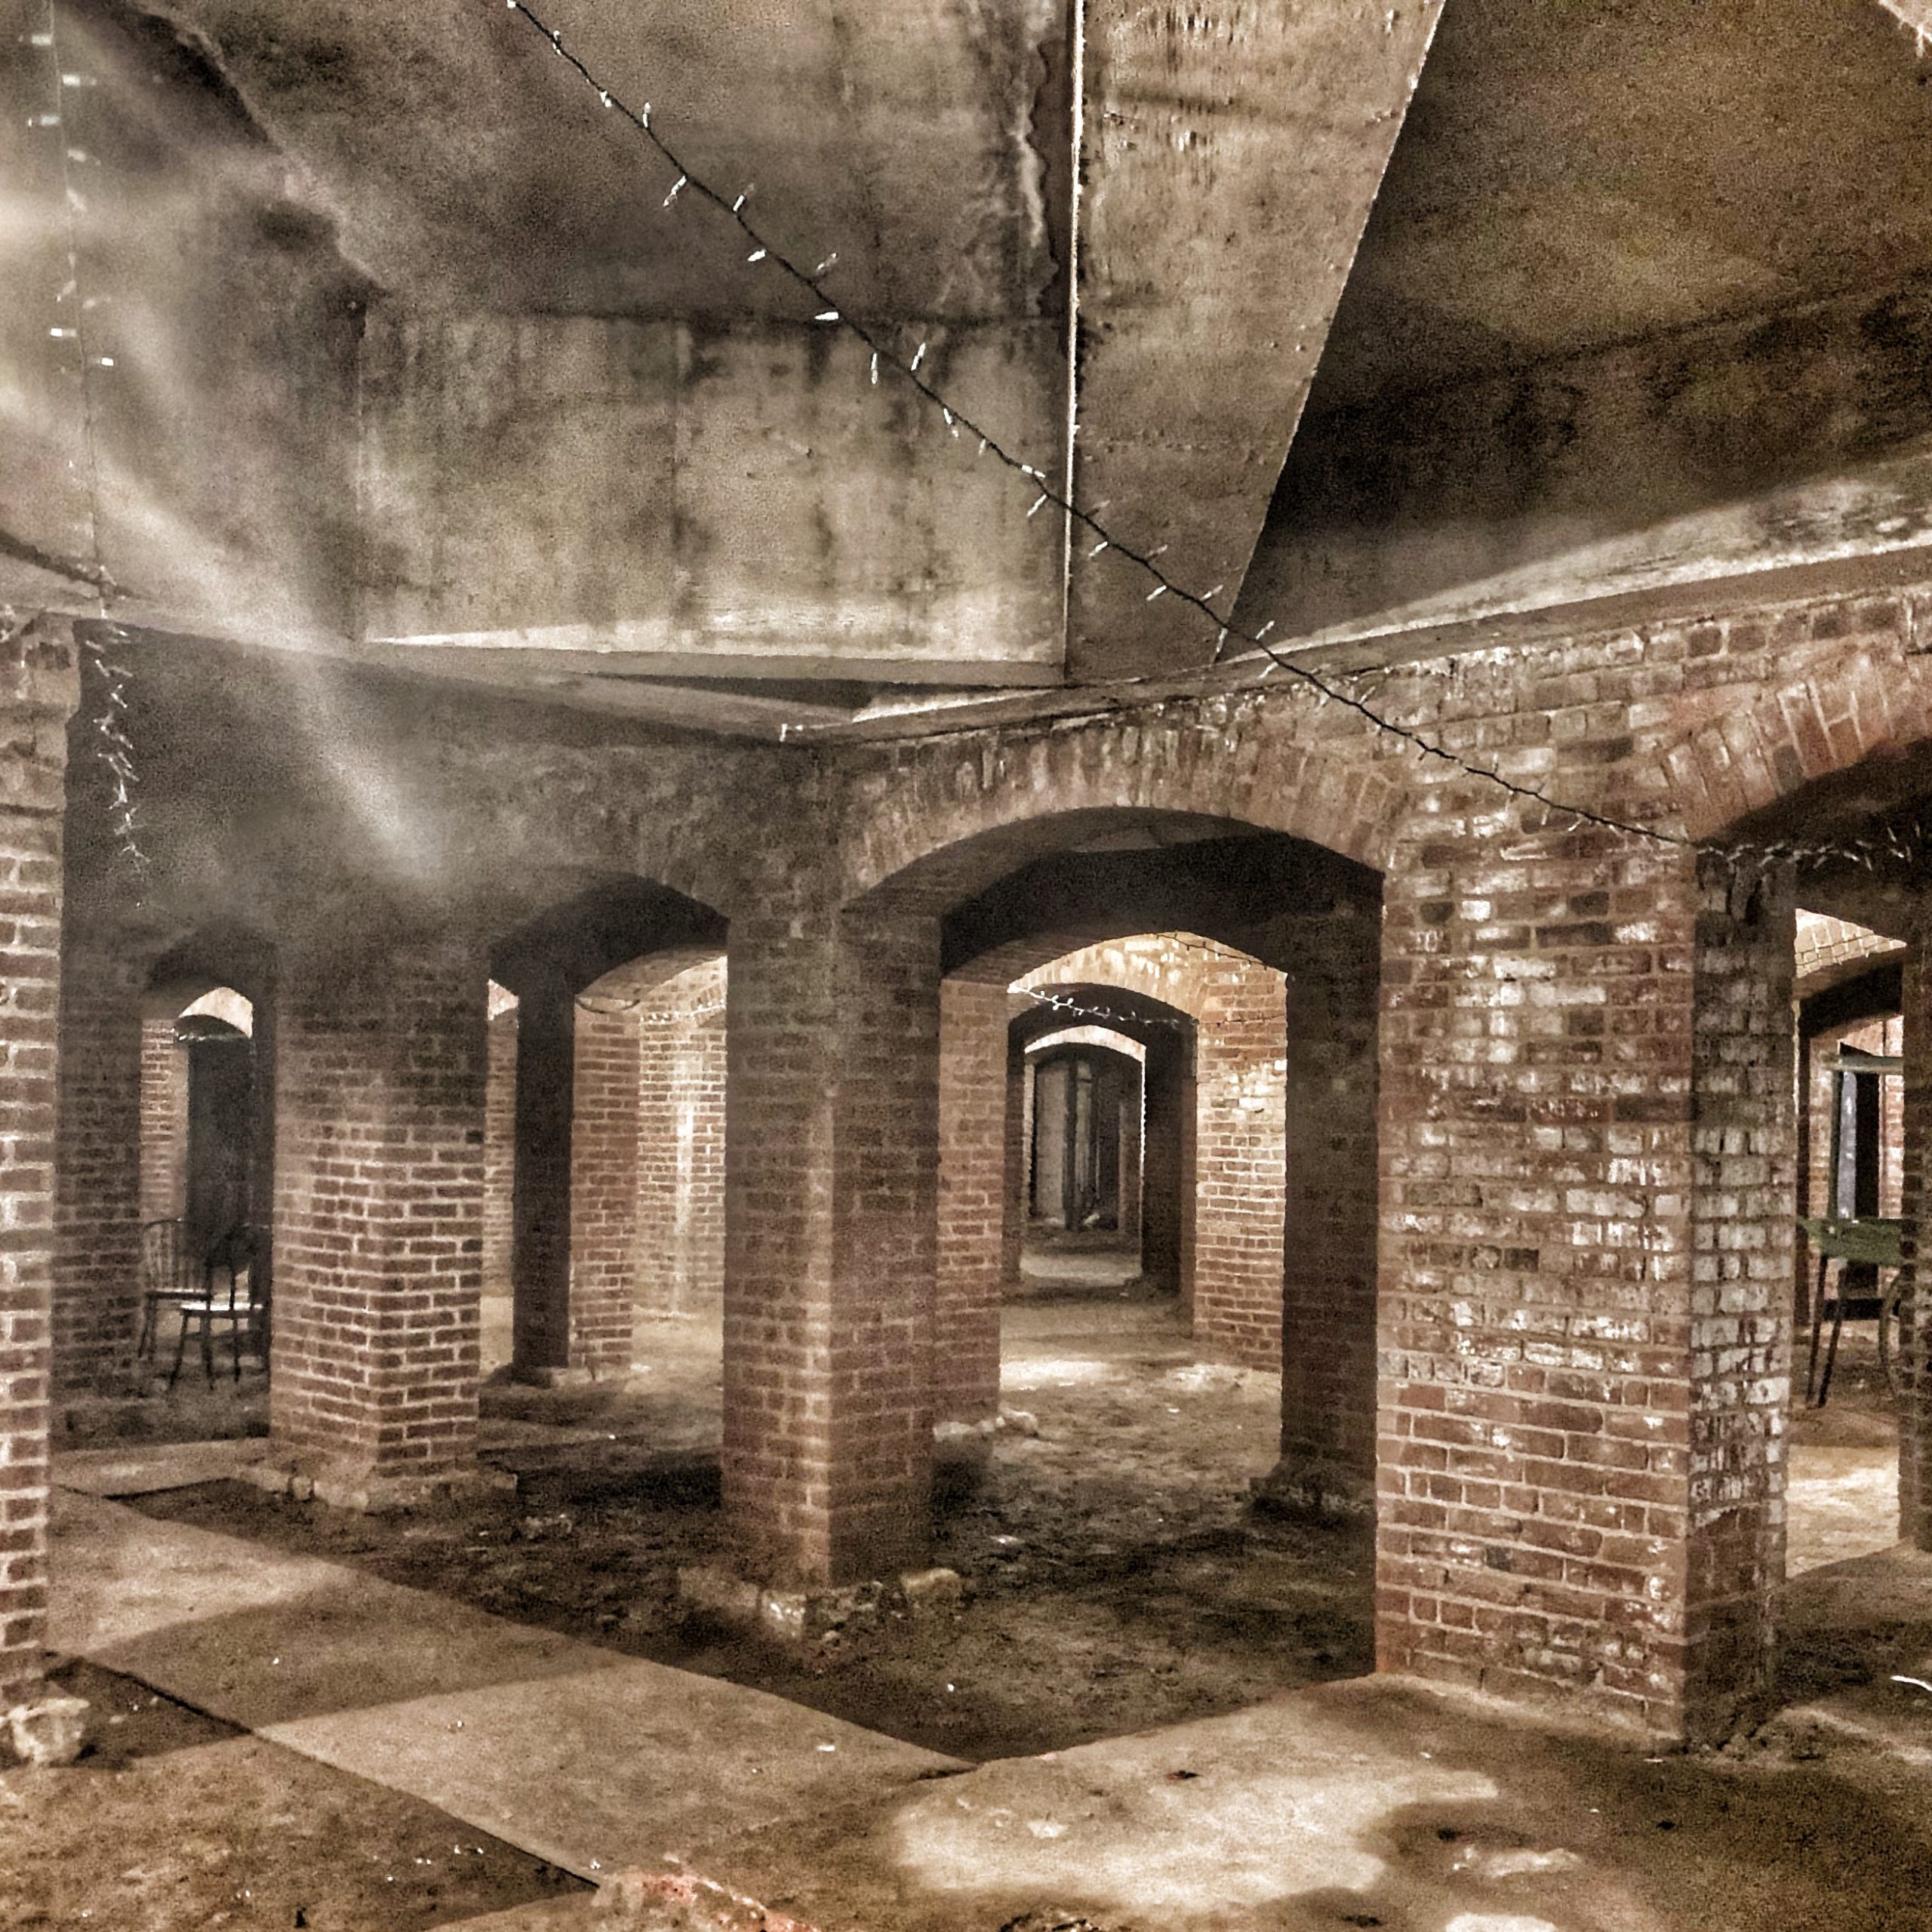 Indianapolis Catacombs City Market 2